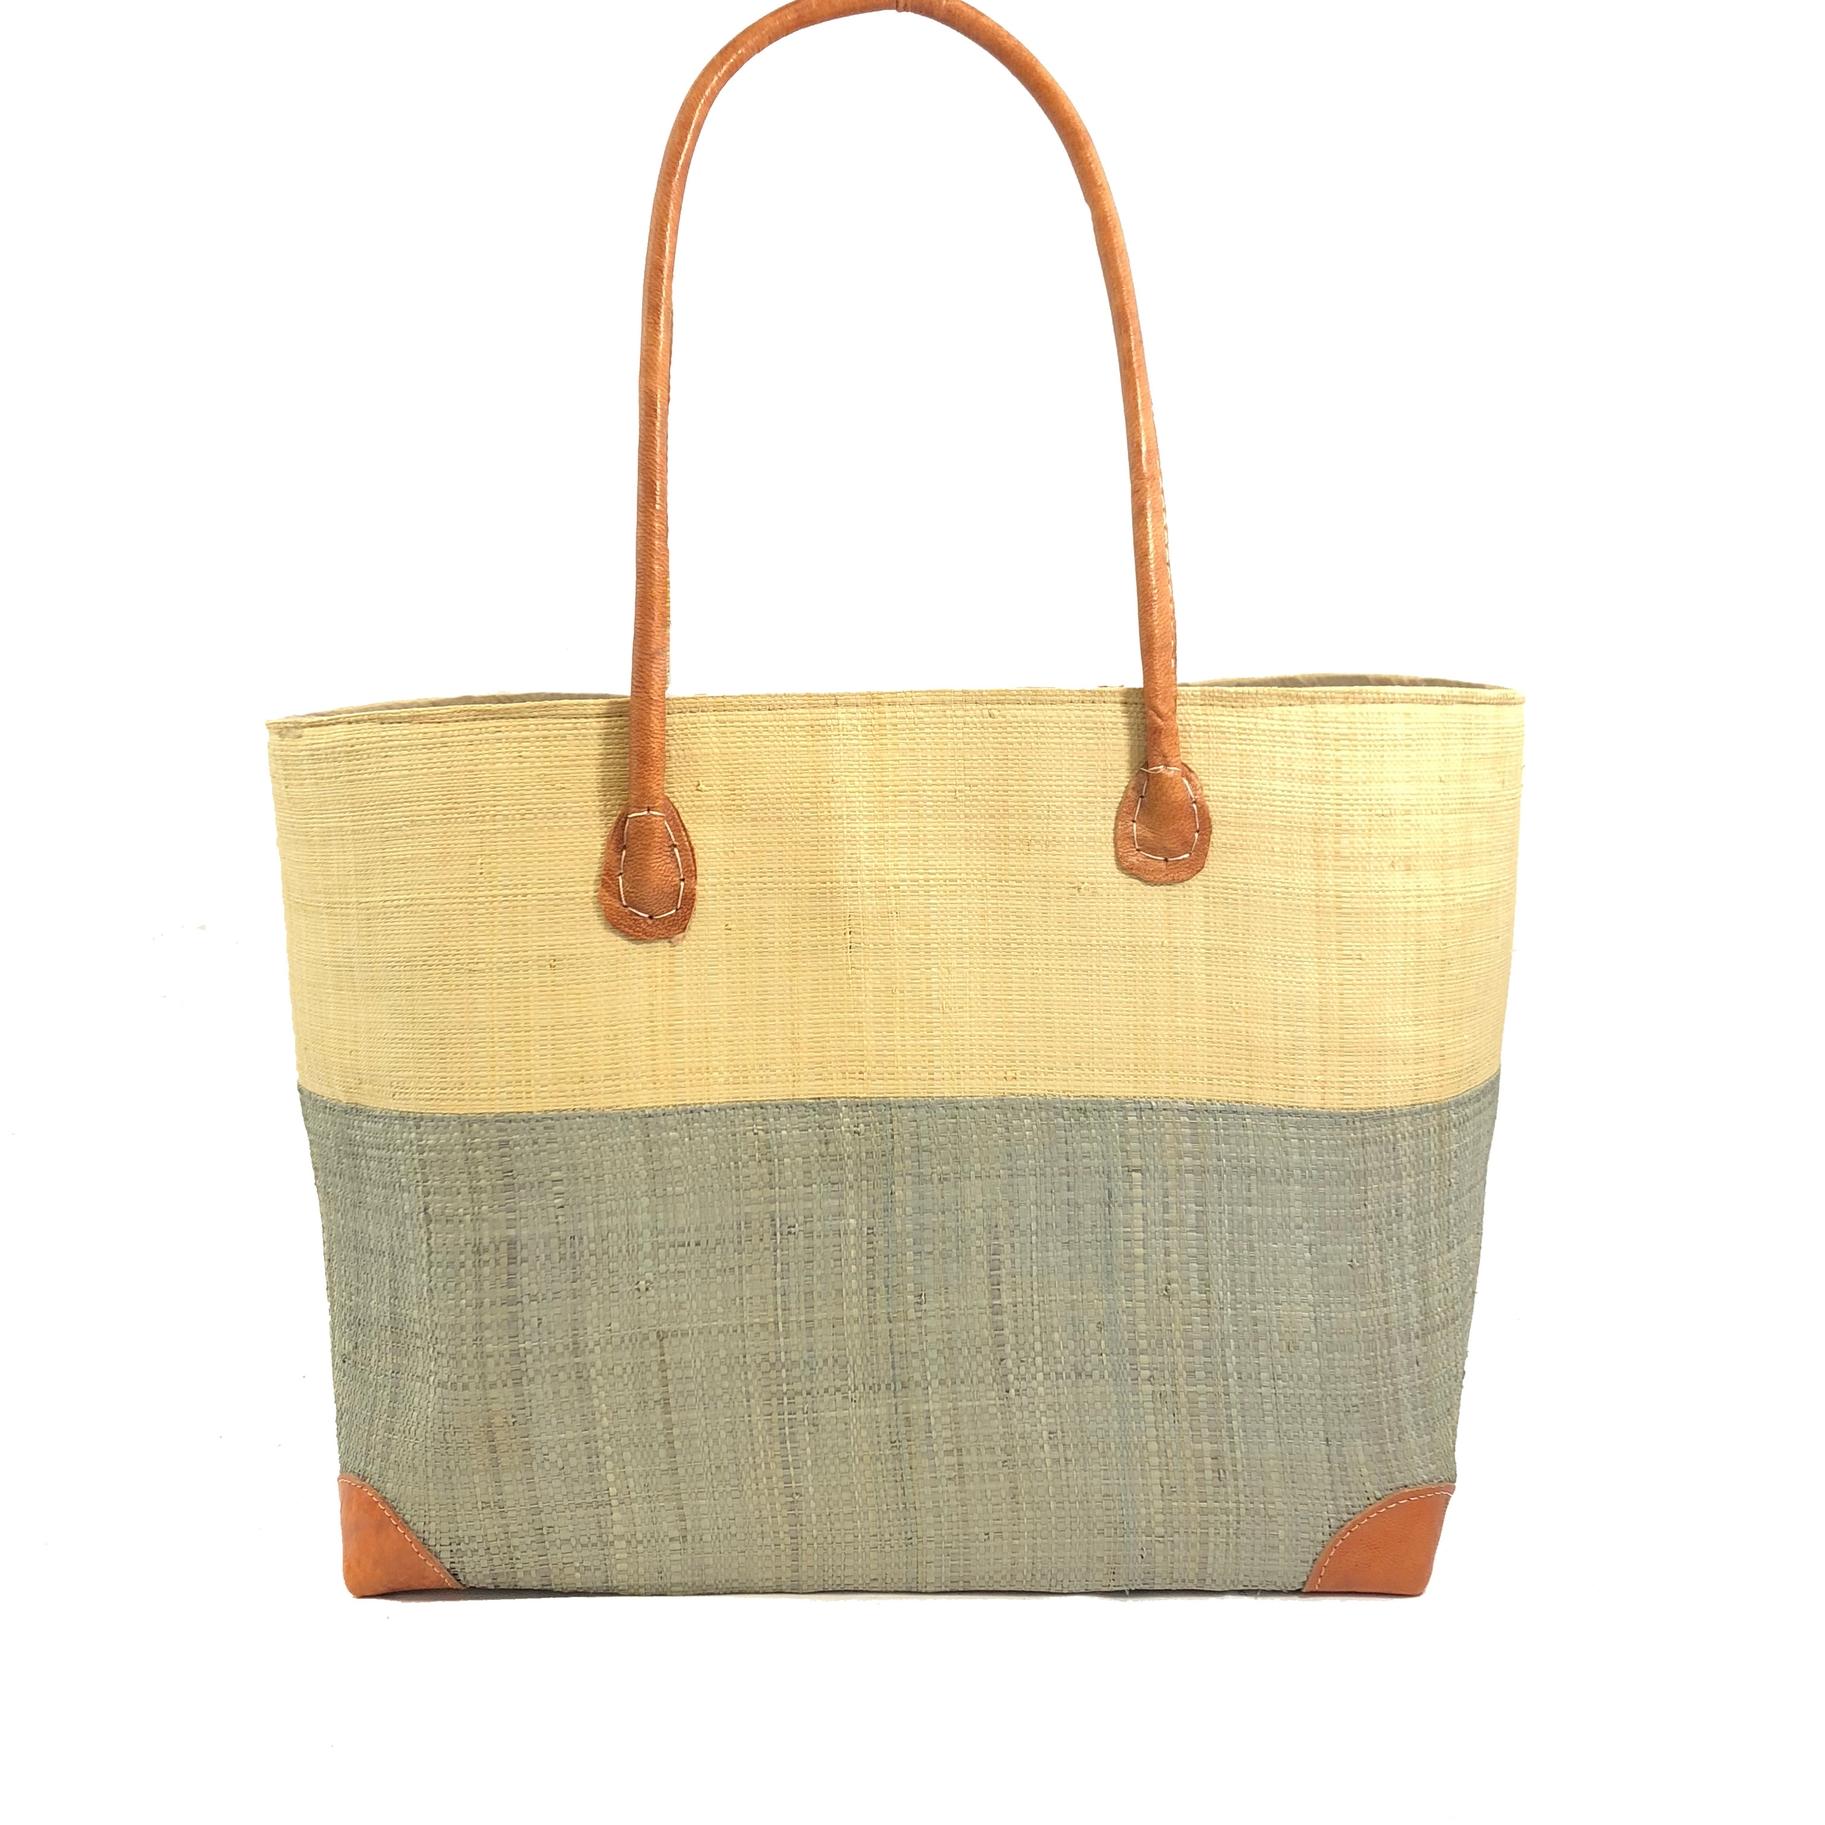 Trinidad Two Tone Straw Basket - Grey | Trada Marketplace